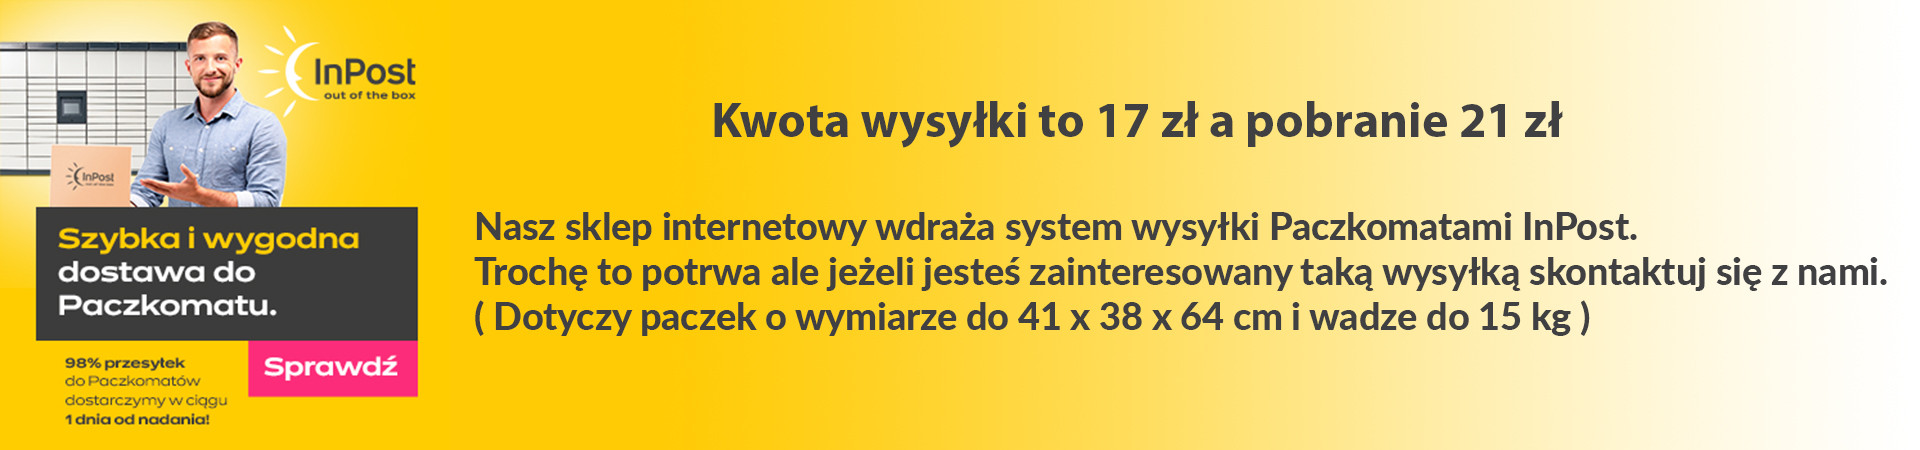 Paczki inPost